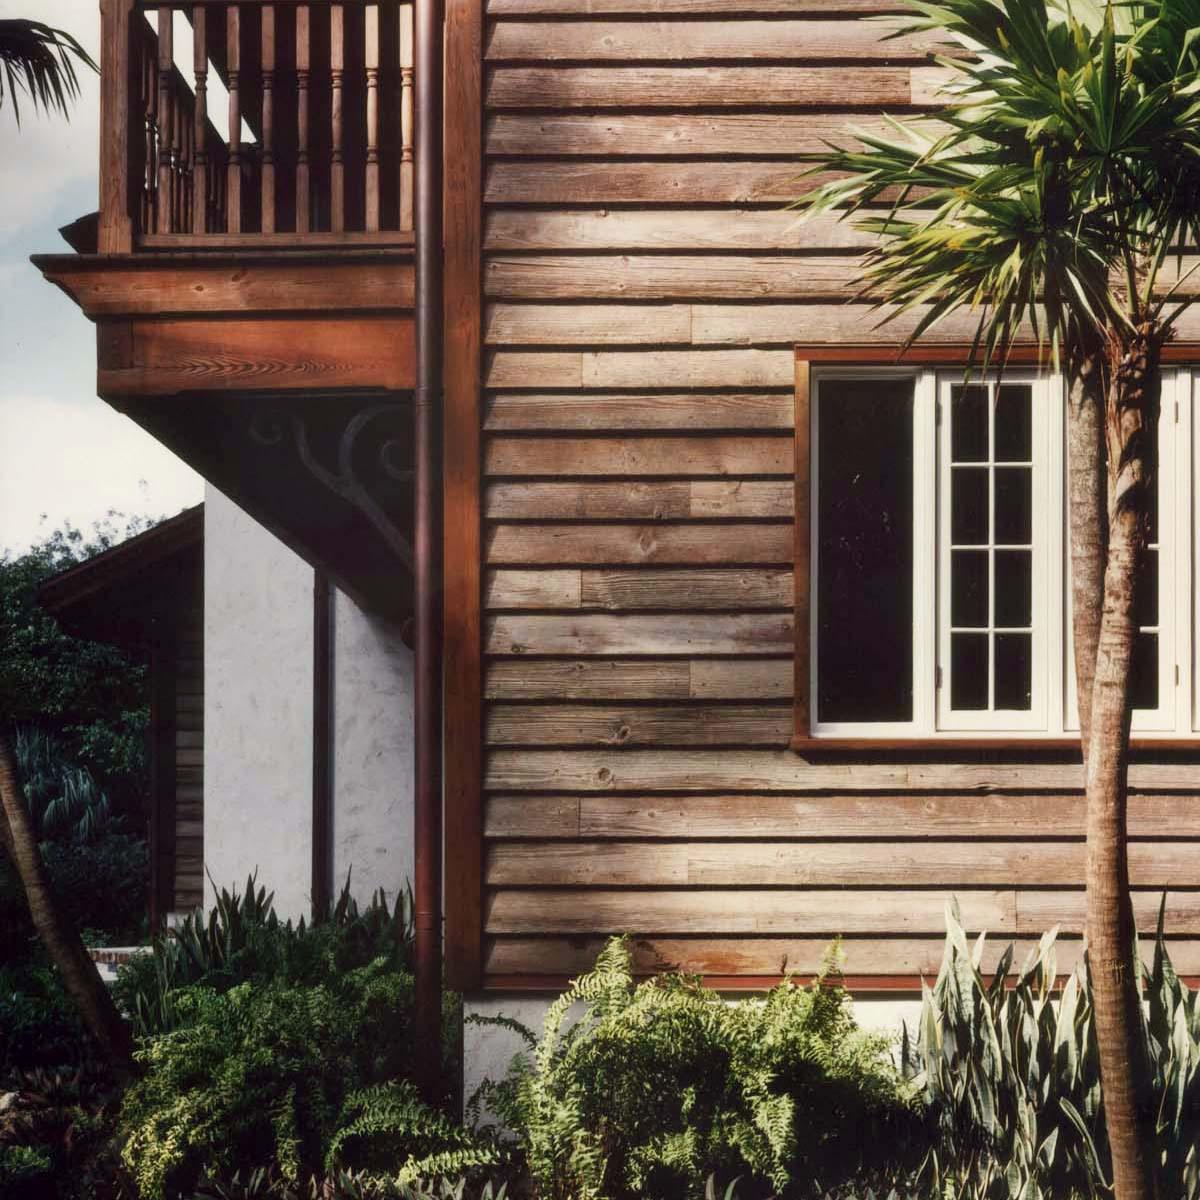 Siding on a Florida Home